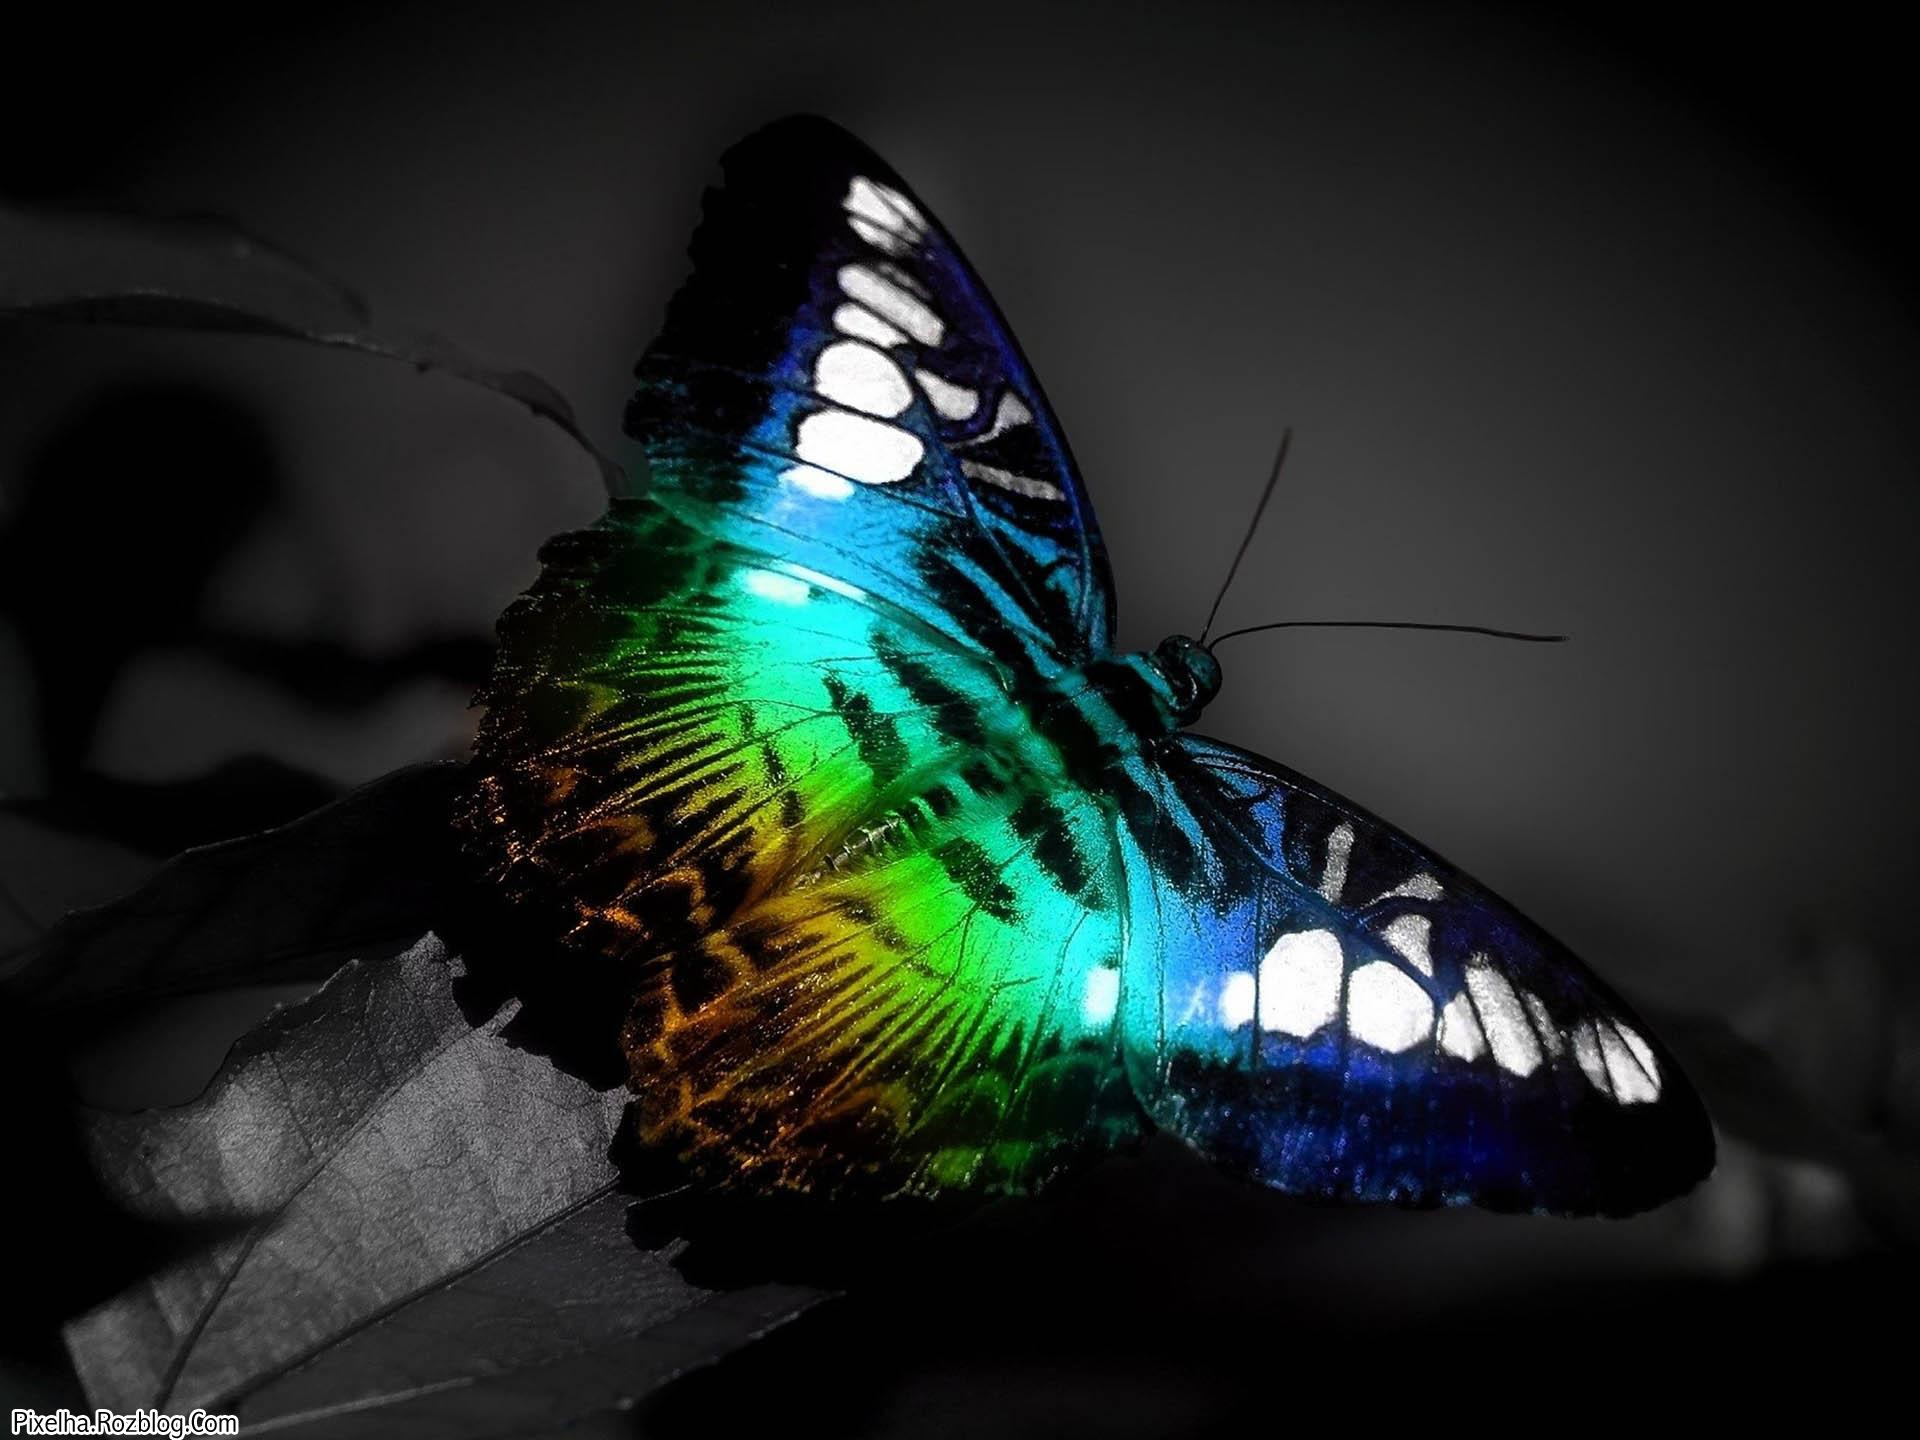 پروانه رنگارنگ